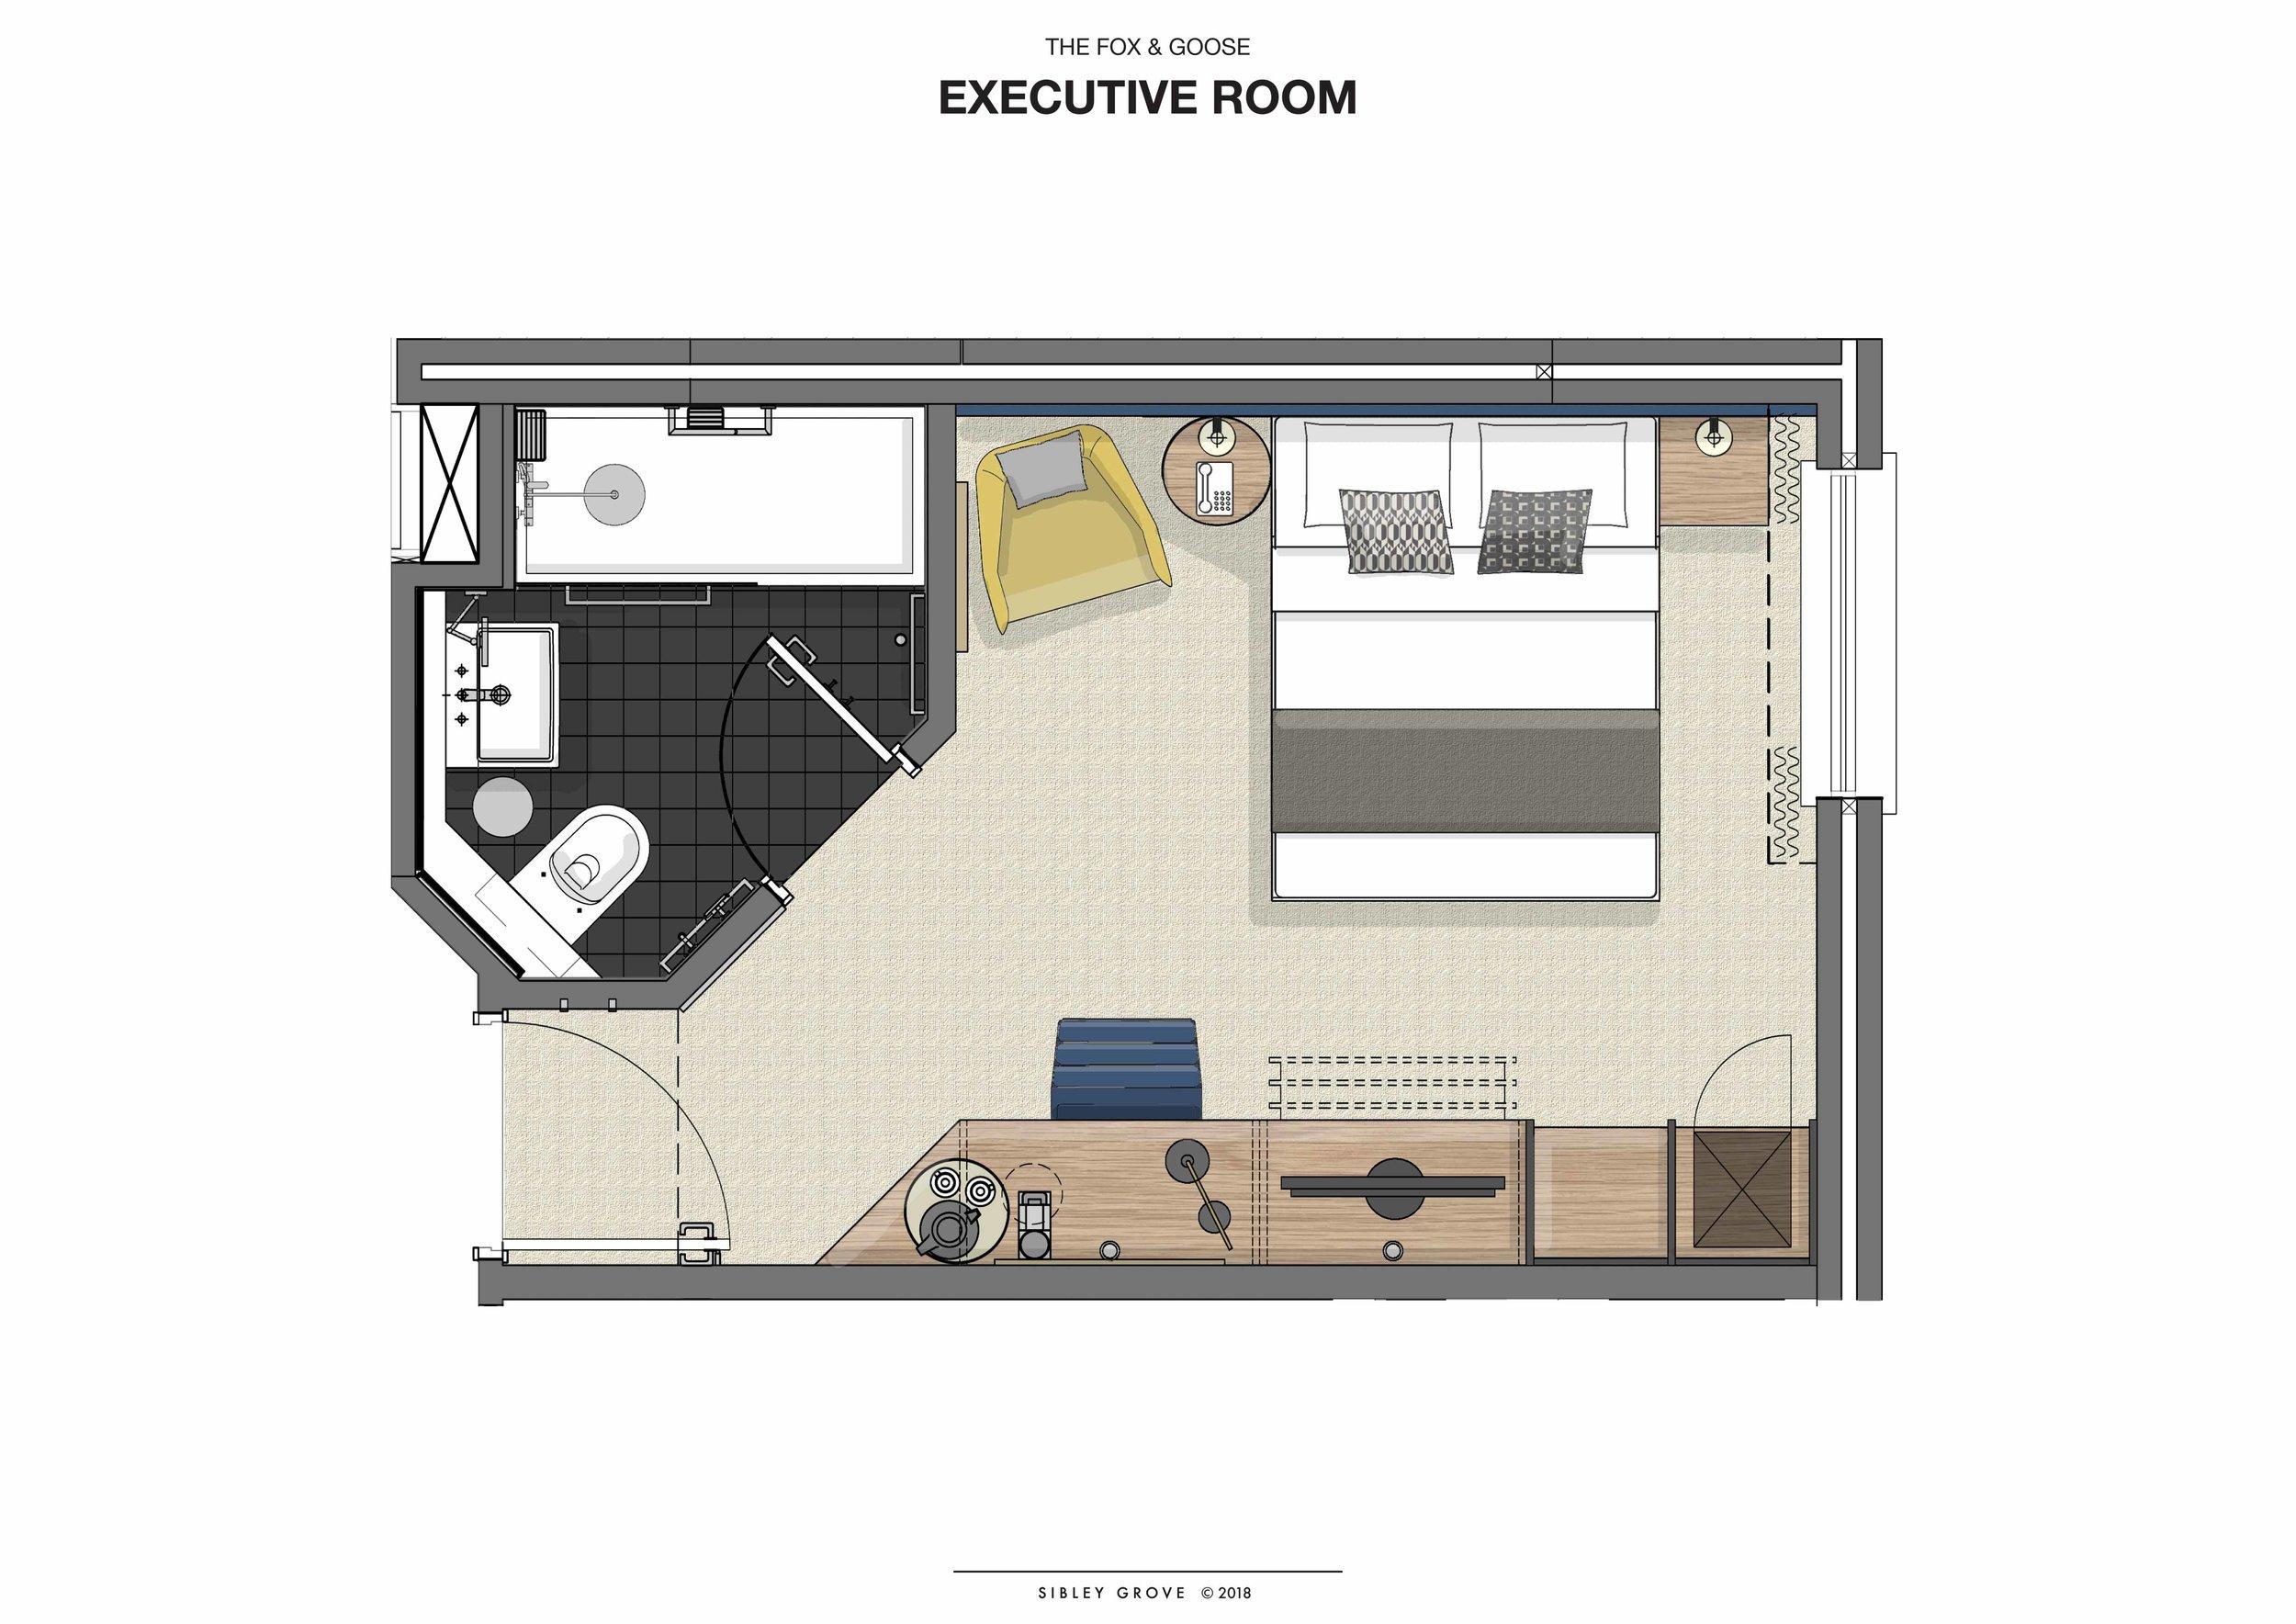 F&G-Floorplan.jpg